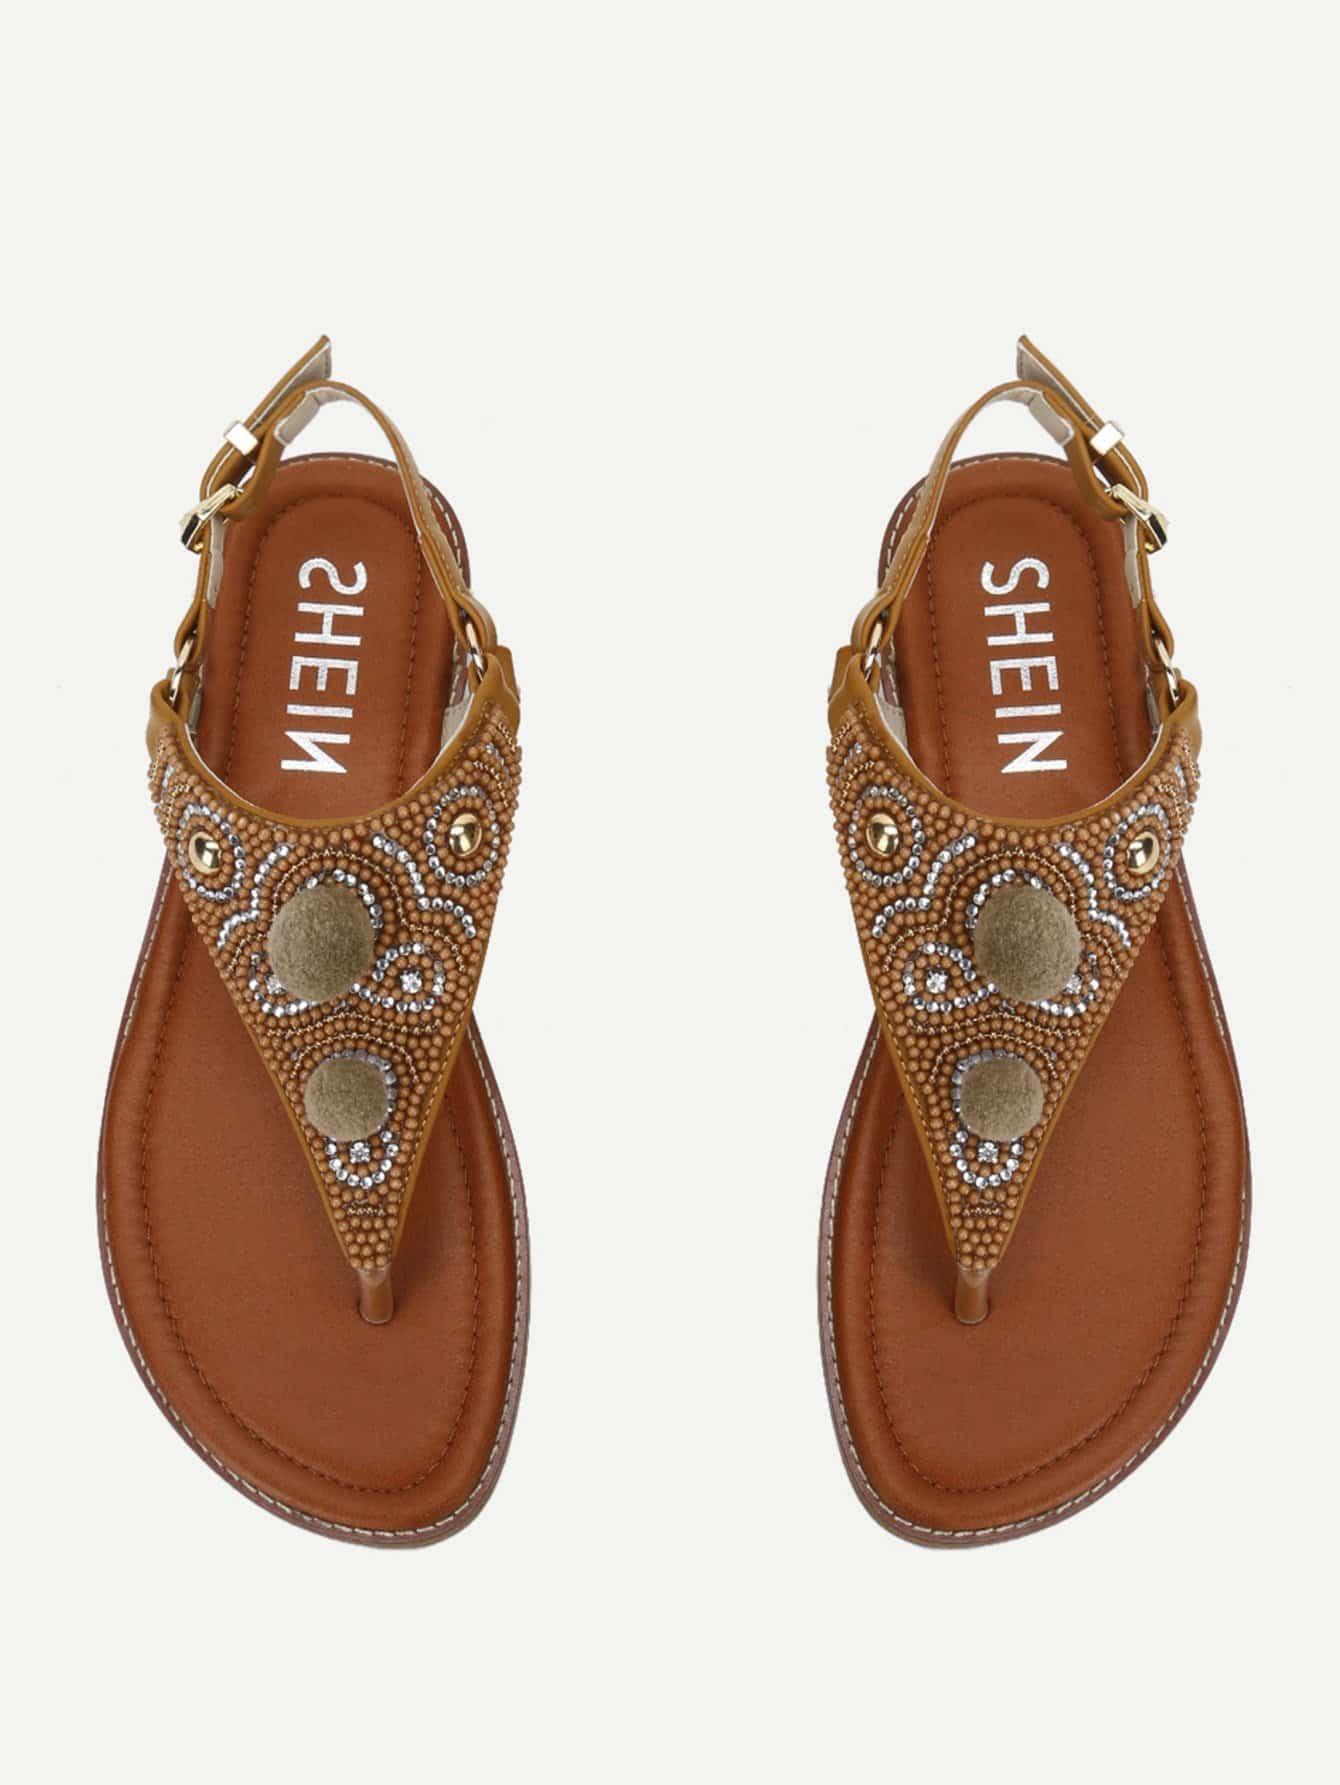 Rhinestone Design Toe Post Sandals rhinestone design toe post sandals